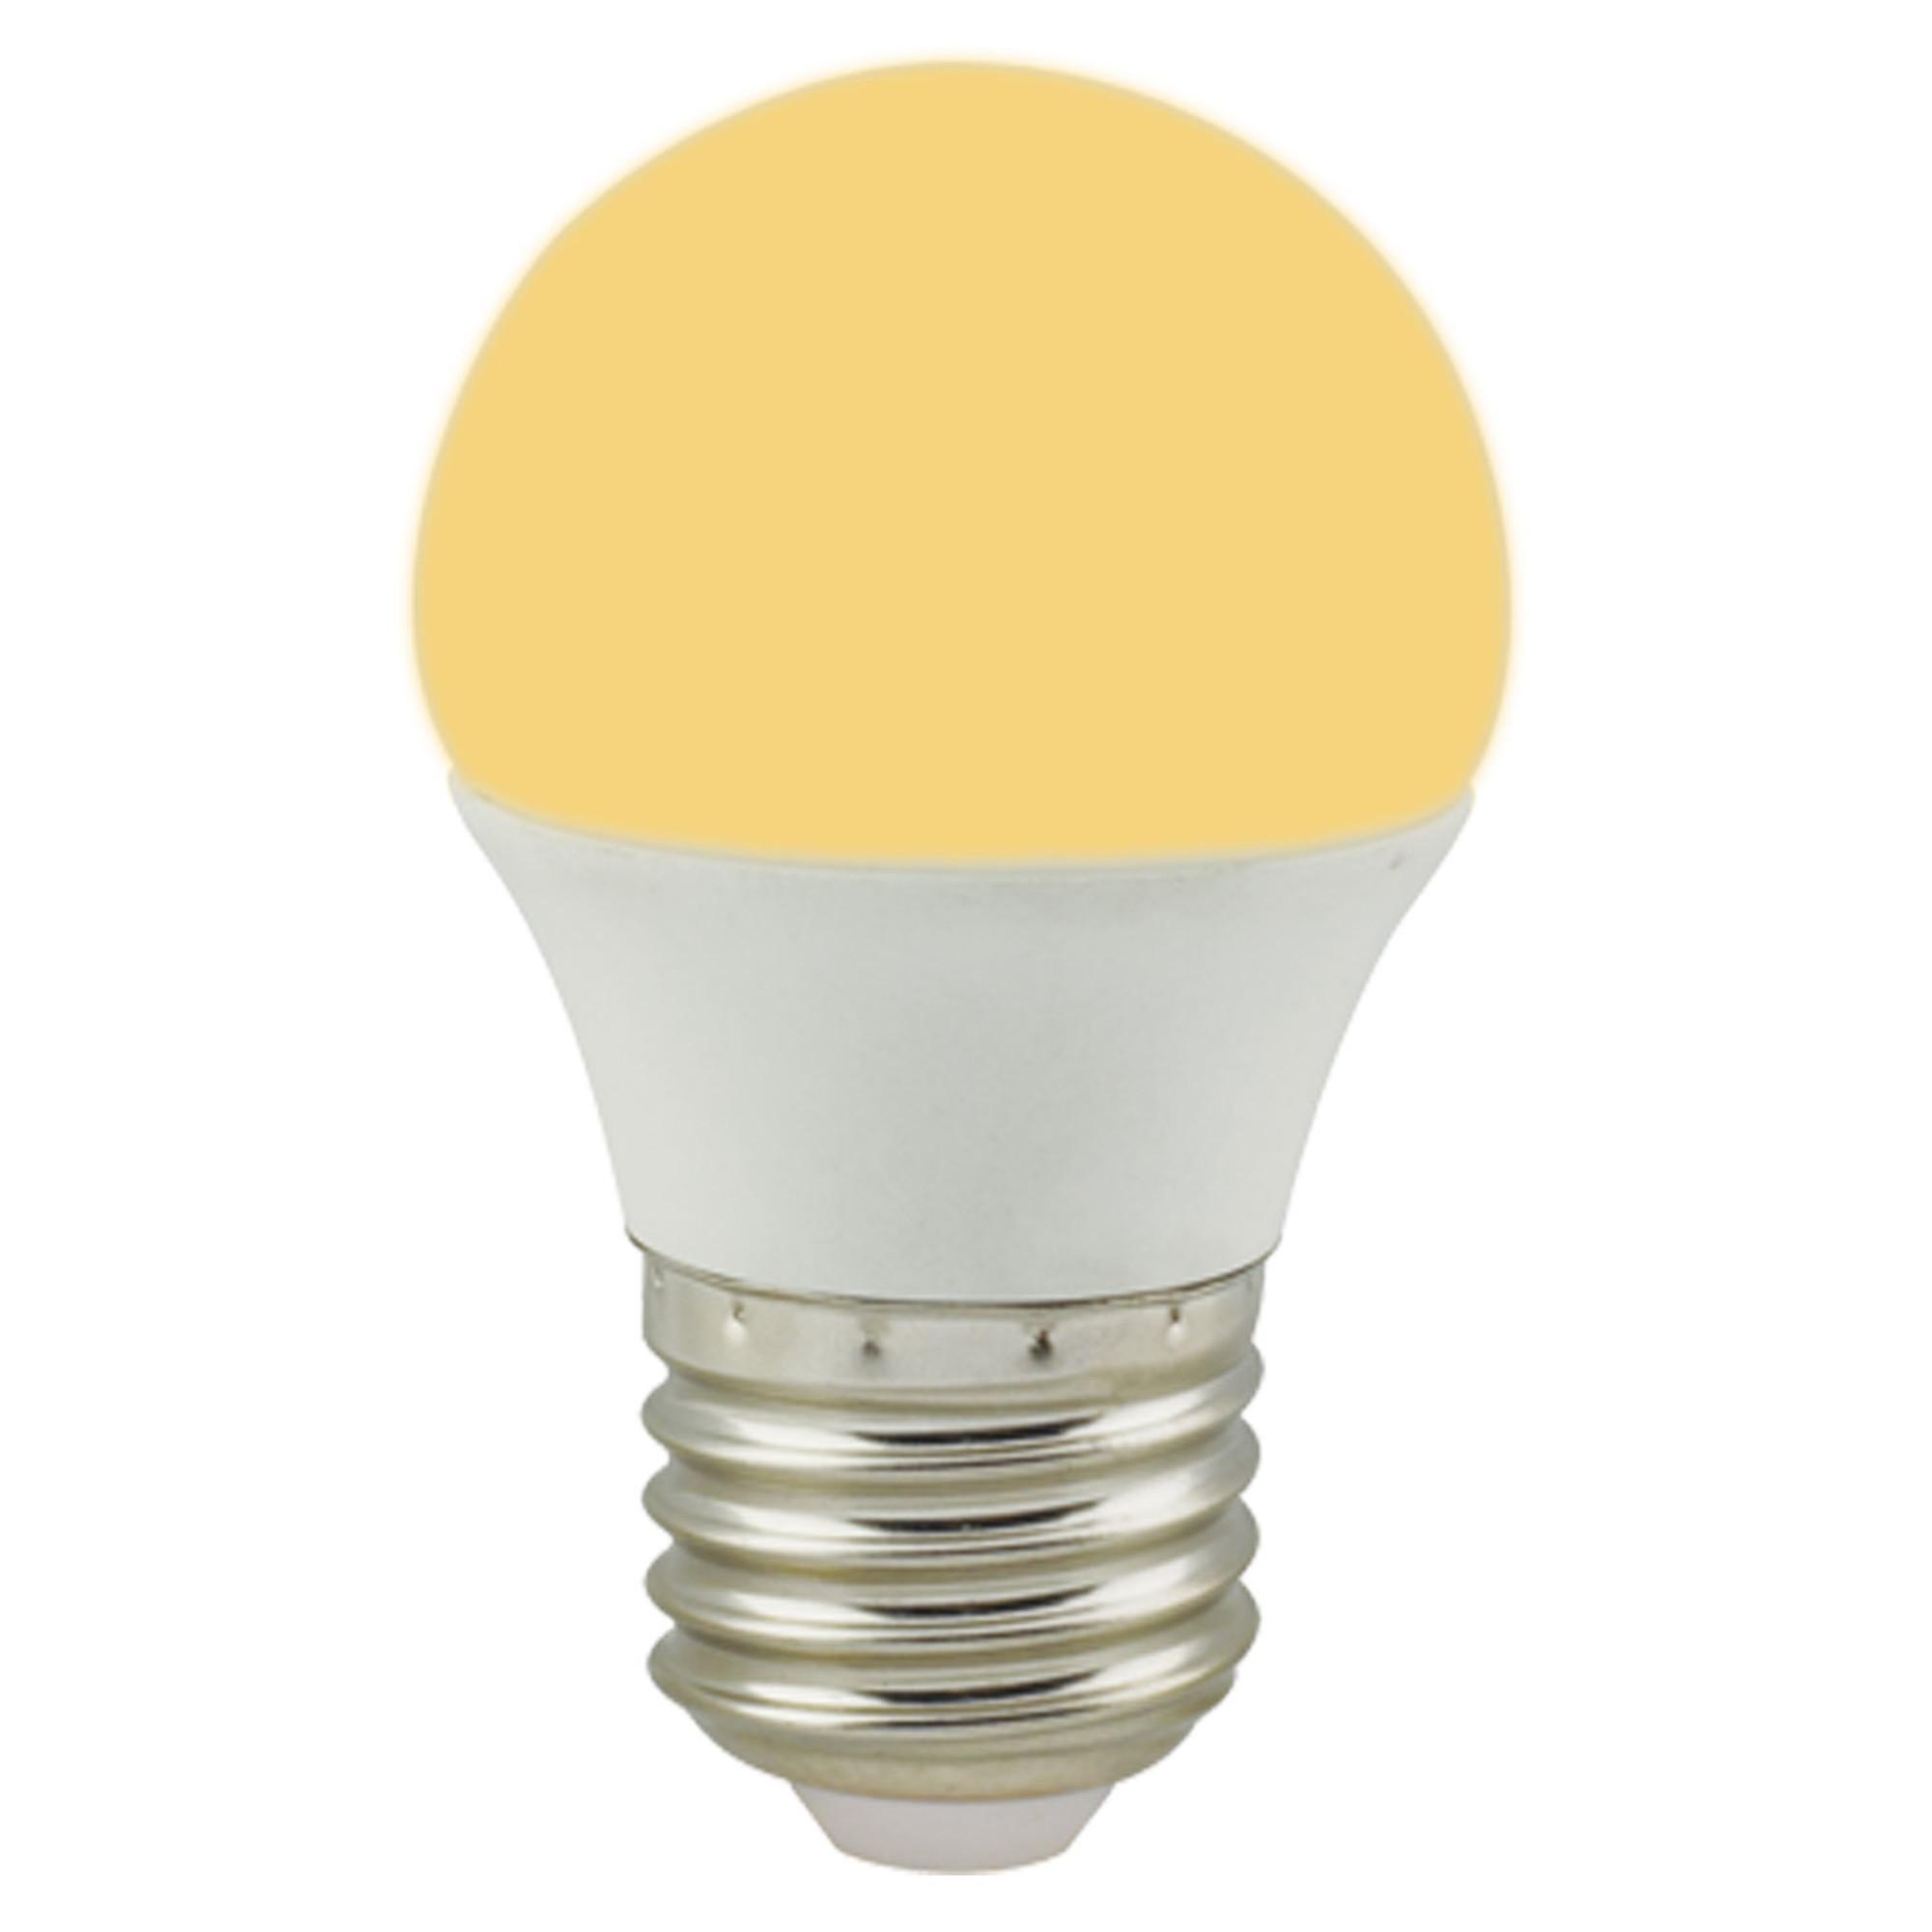 Лампа Ecola Premium светодионая E27 8 Вт шар 640 Лм теплый свет